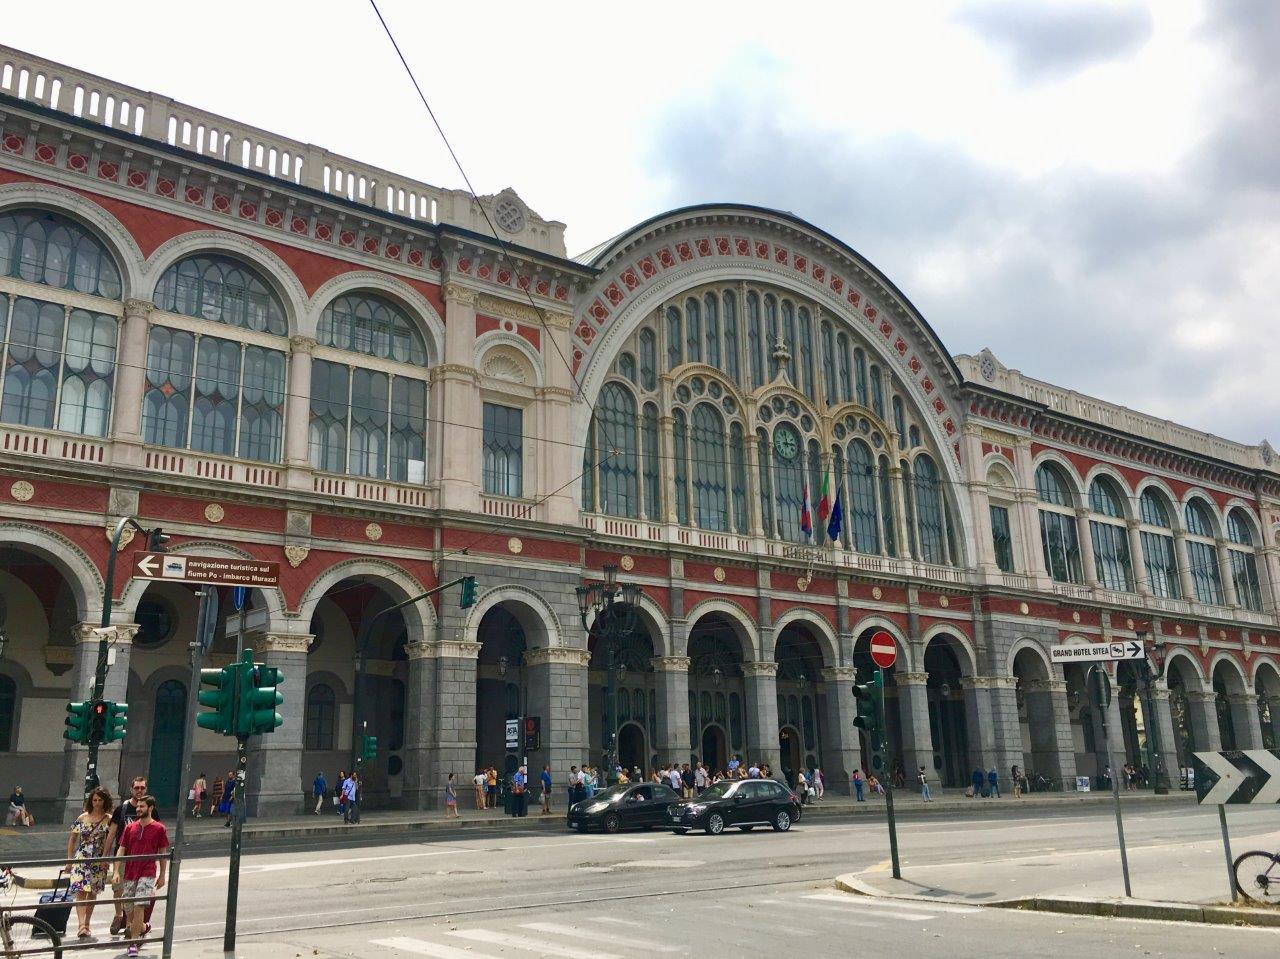 stazione-torino-porta-nuova-railway-station